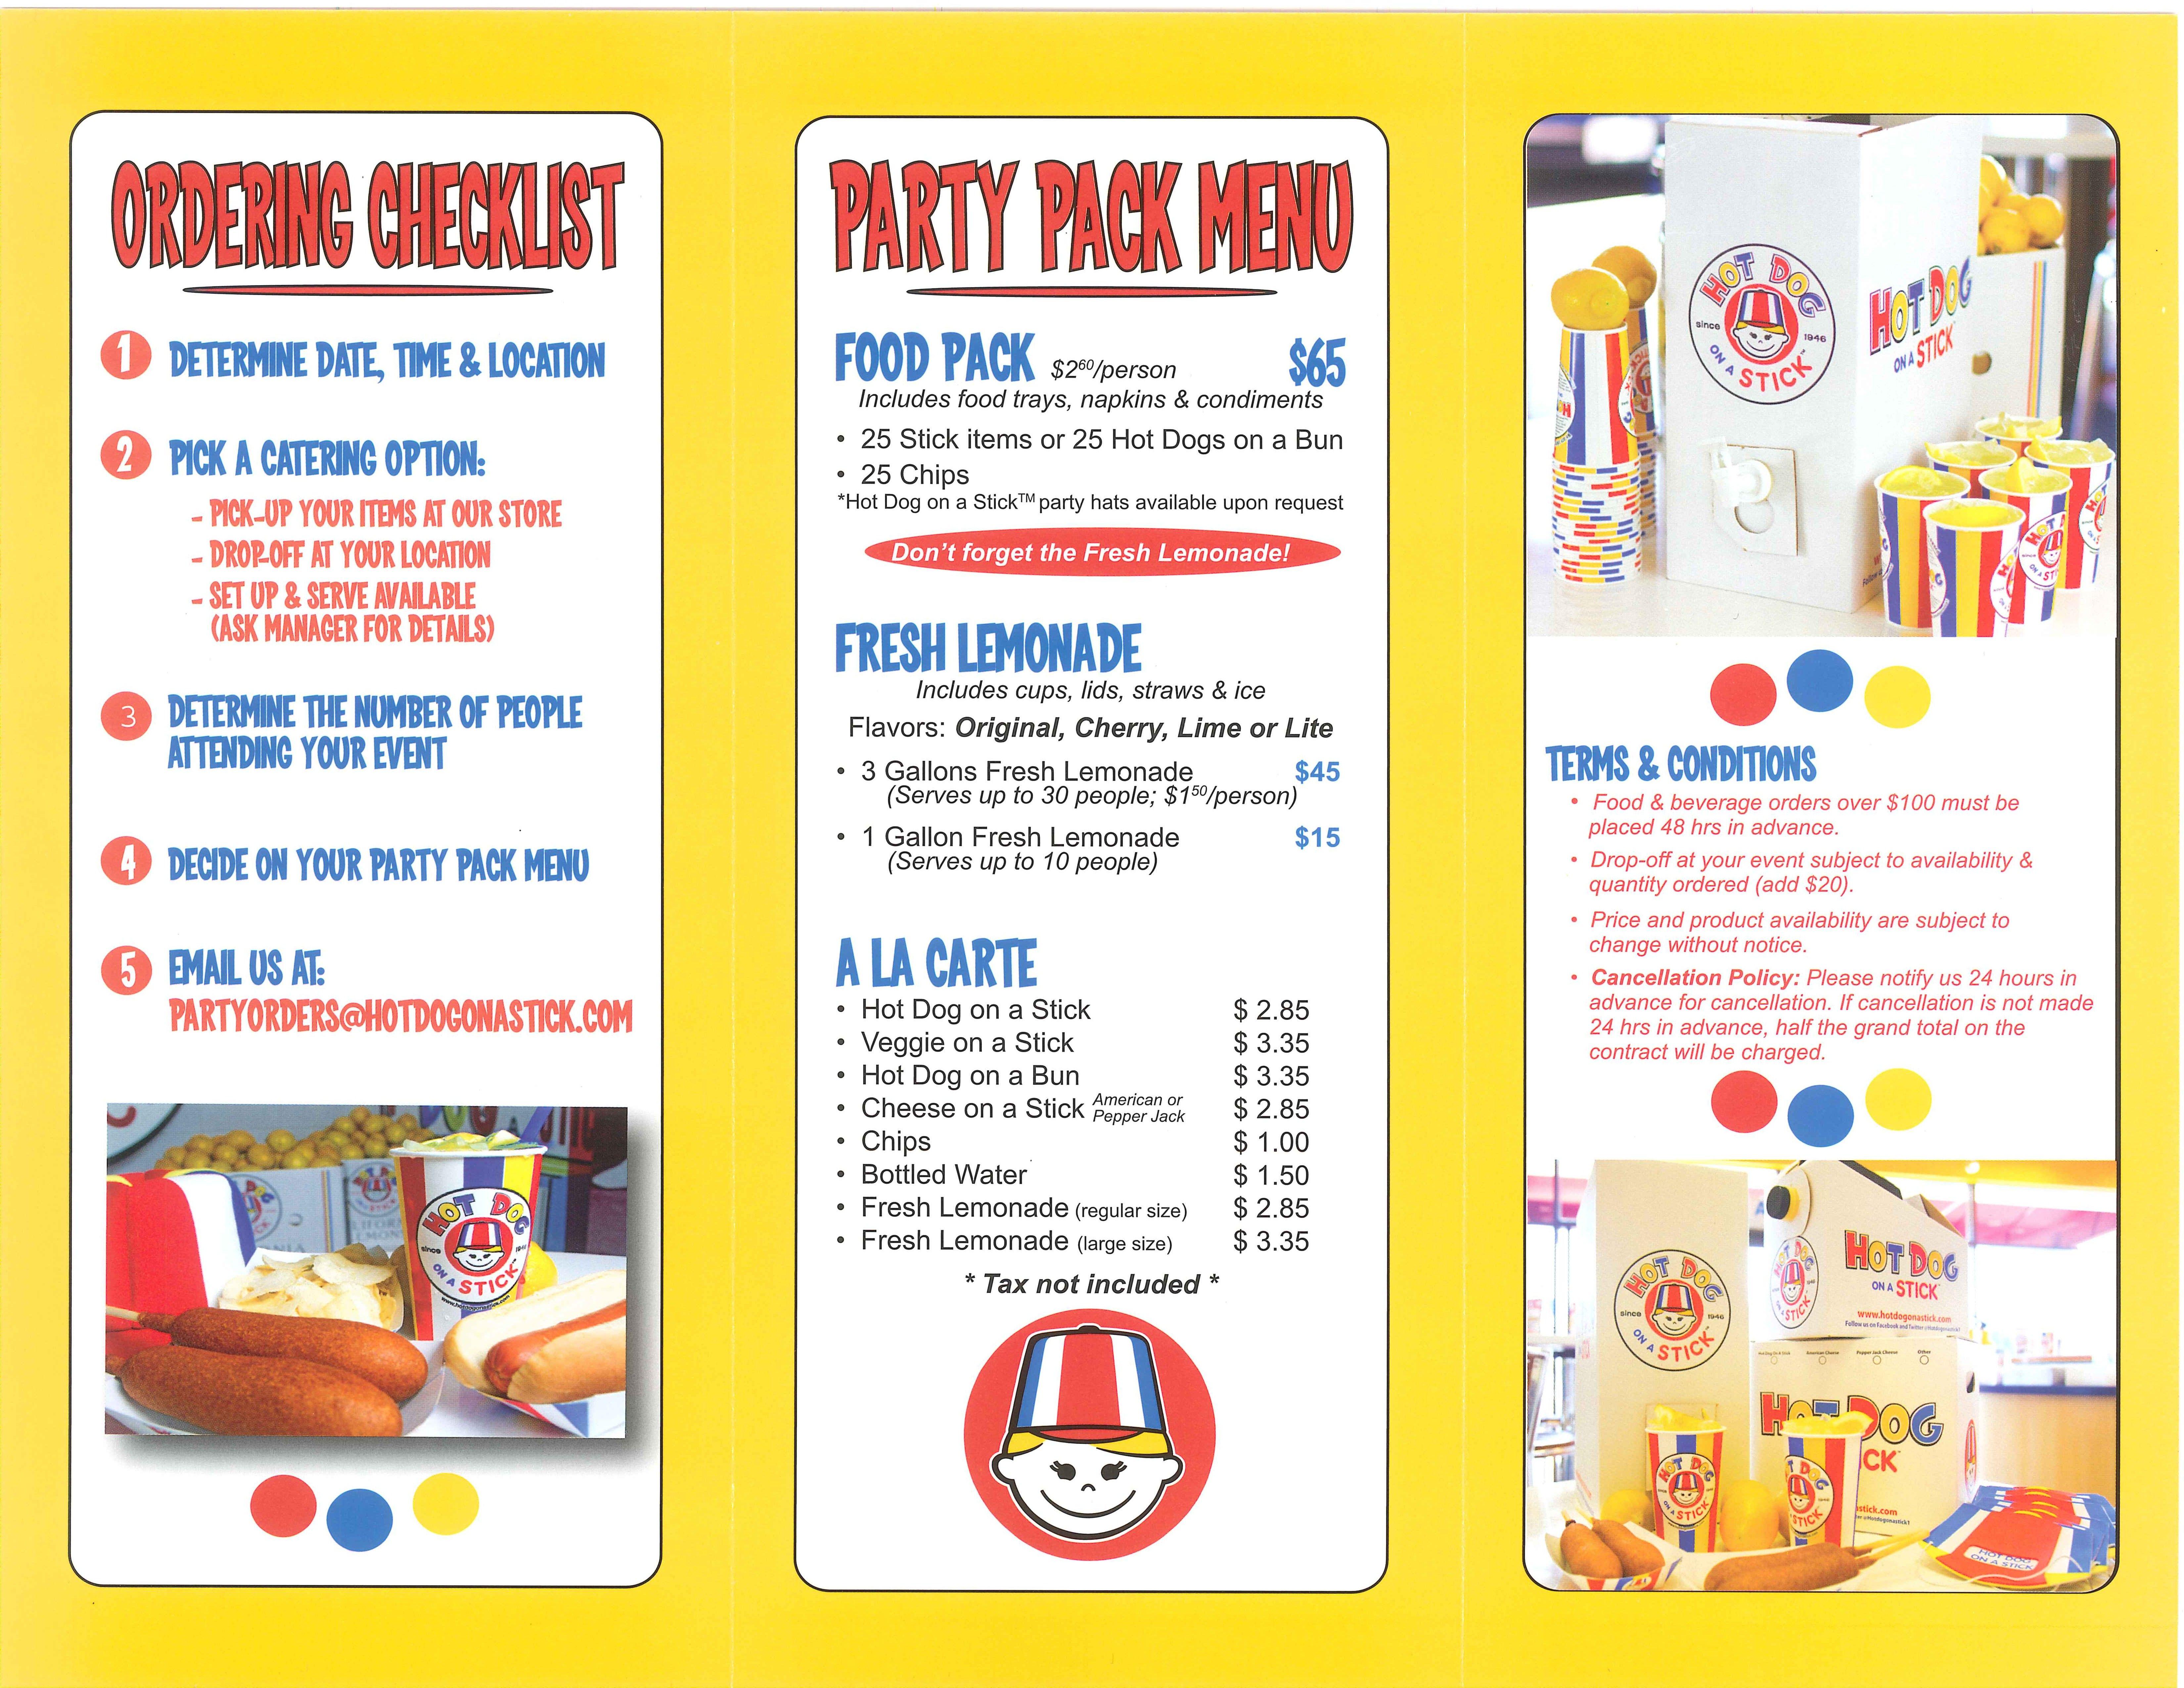 Hot Dog on a Stick color pallet. Party packs, Food pack